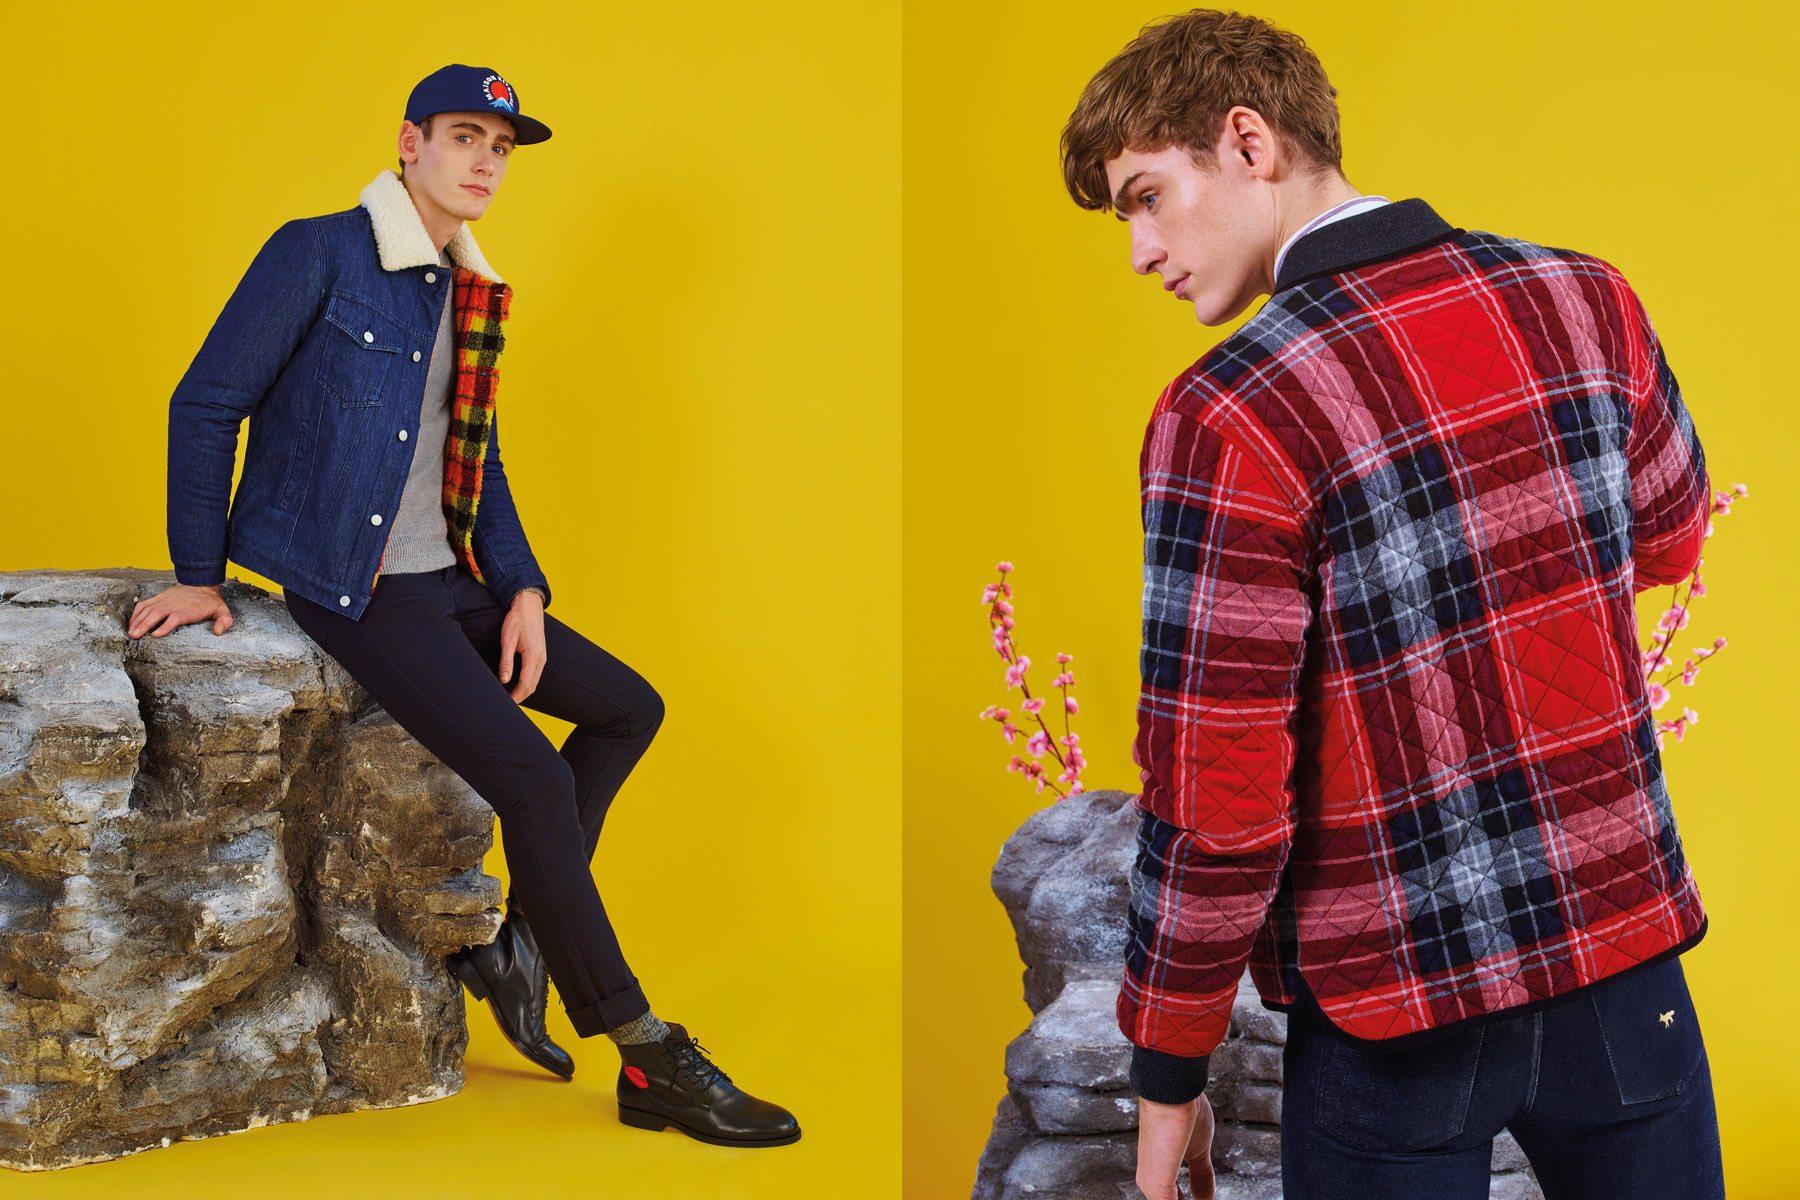 The latest Maison Kitsuné menswear lookbook, for Fall/Winter 2016. Photographed by Pierpaolo Ferrari. Pony boy magazine NY.